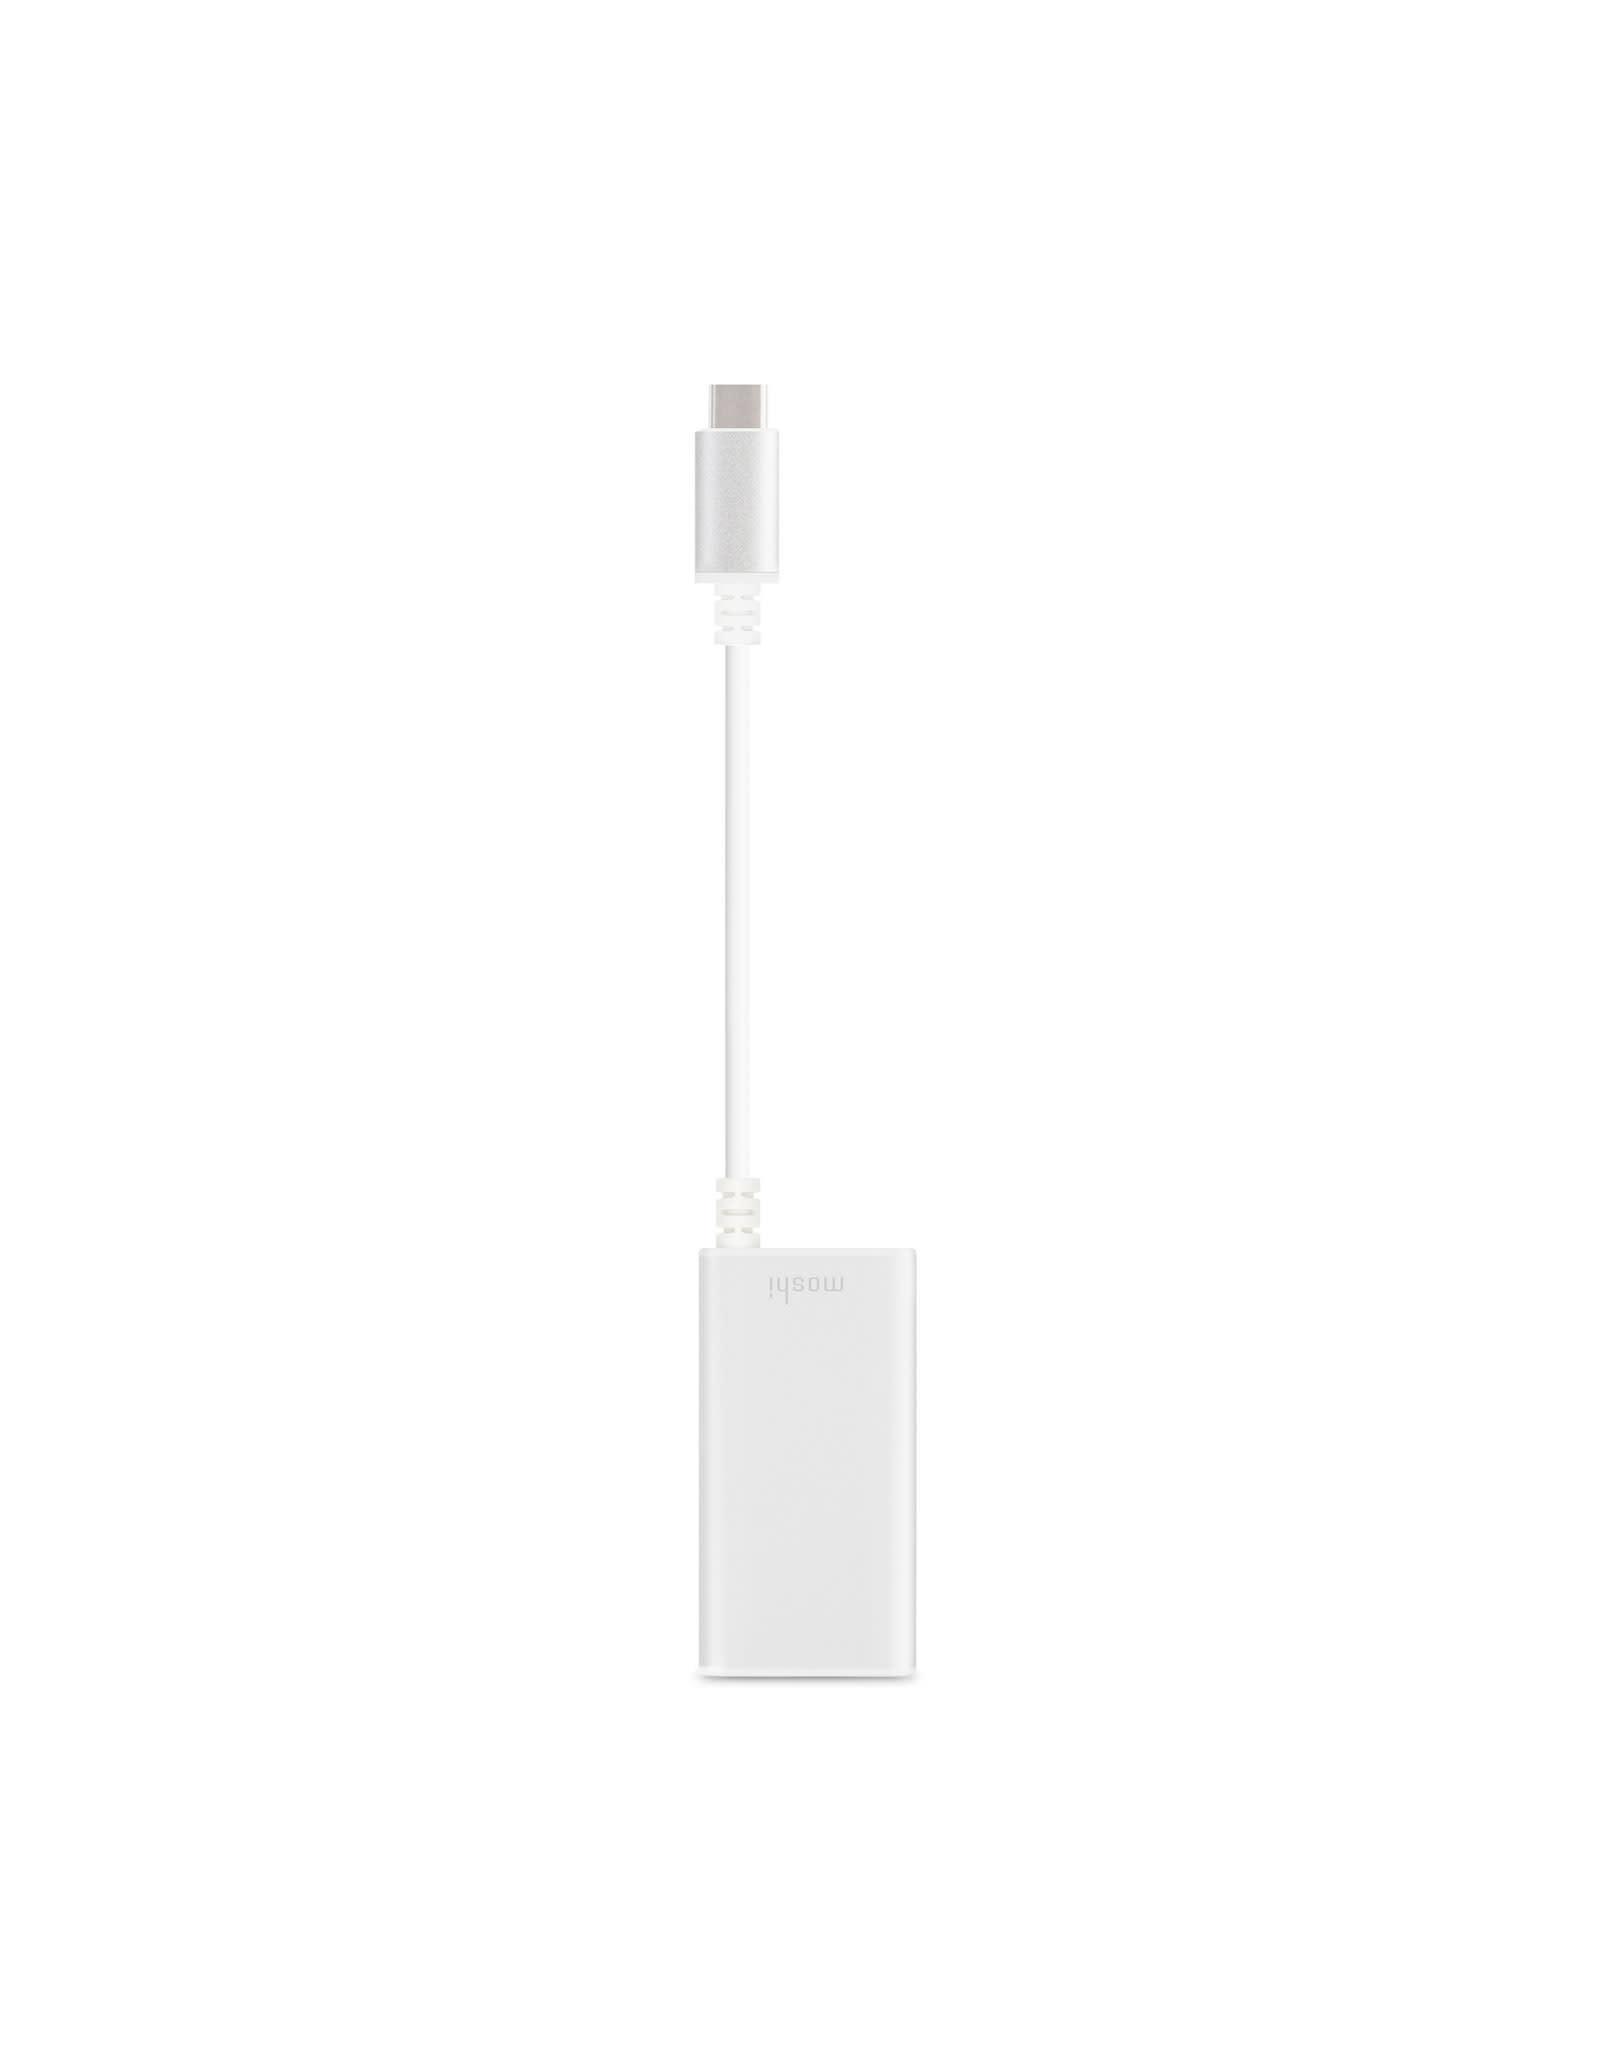 Moshi USB-C to Gigabit Ethernet Adapter